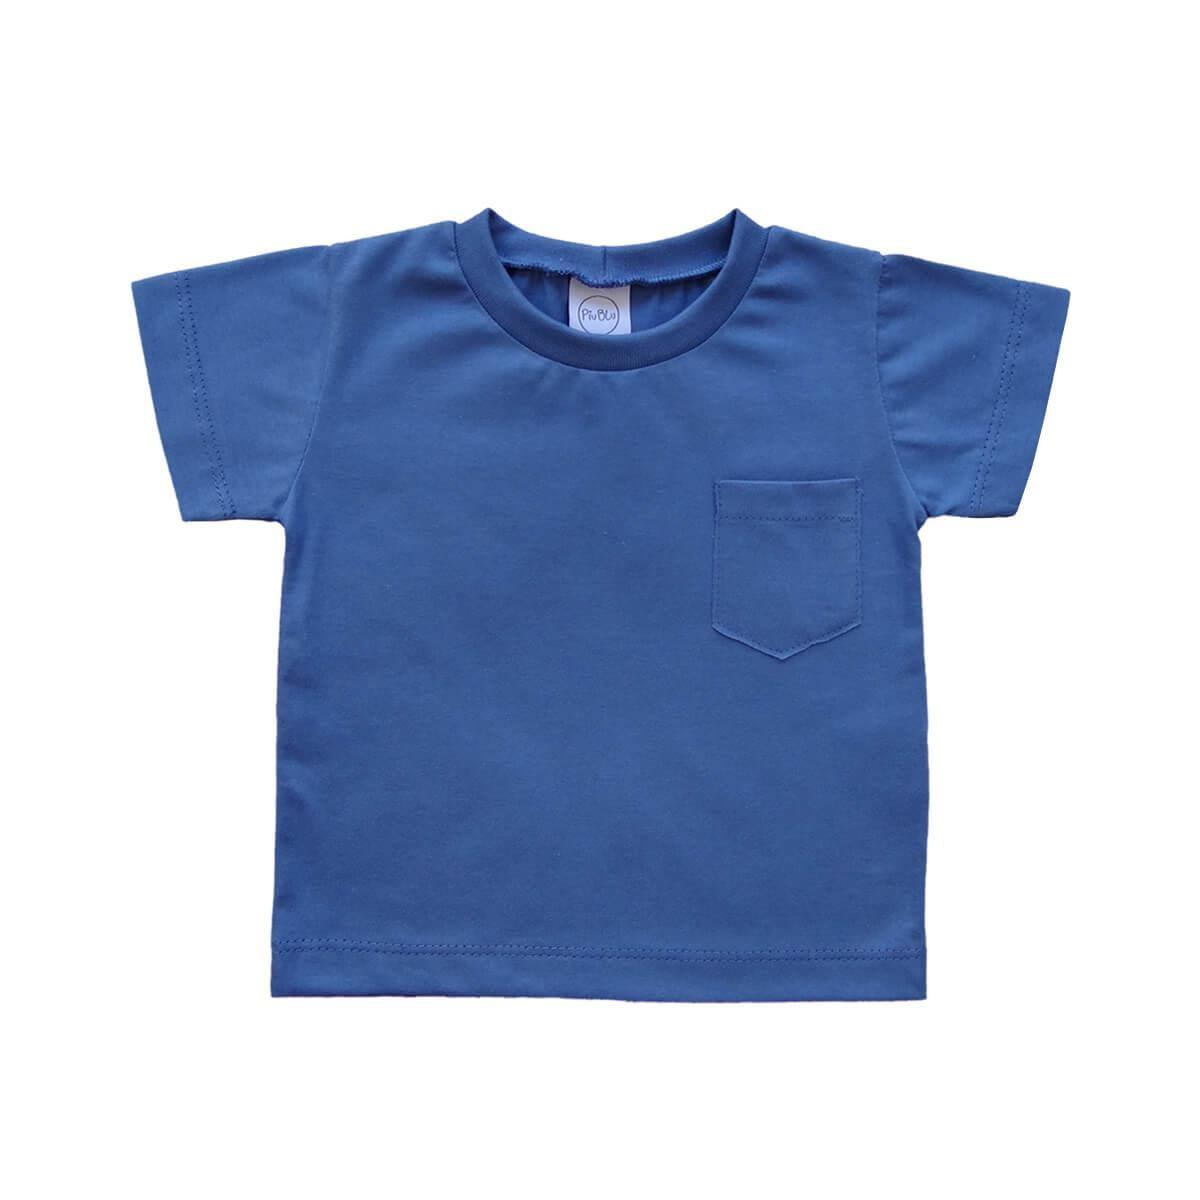 Camiseta Manga Curta Azul 1 ao 3